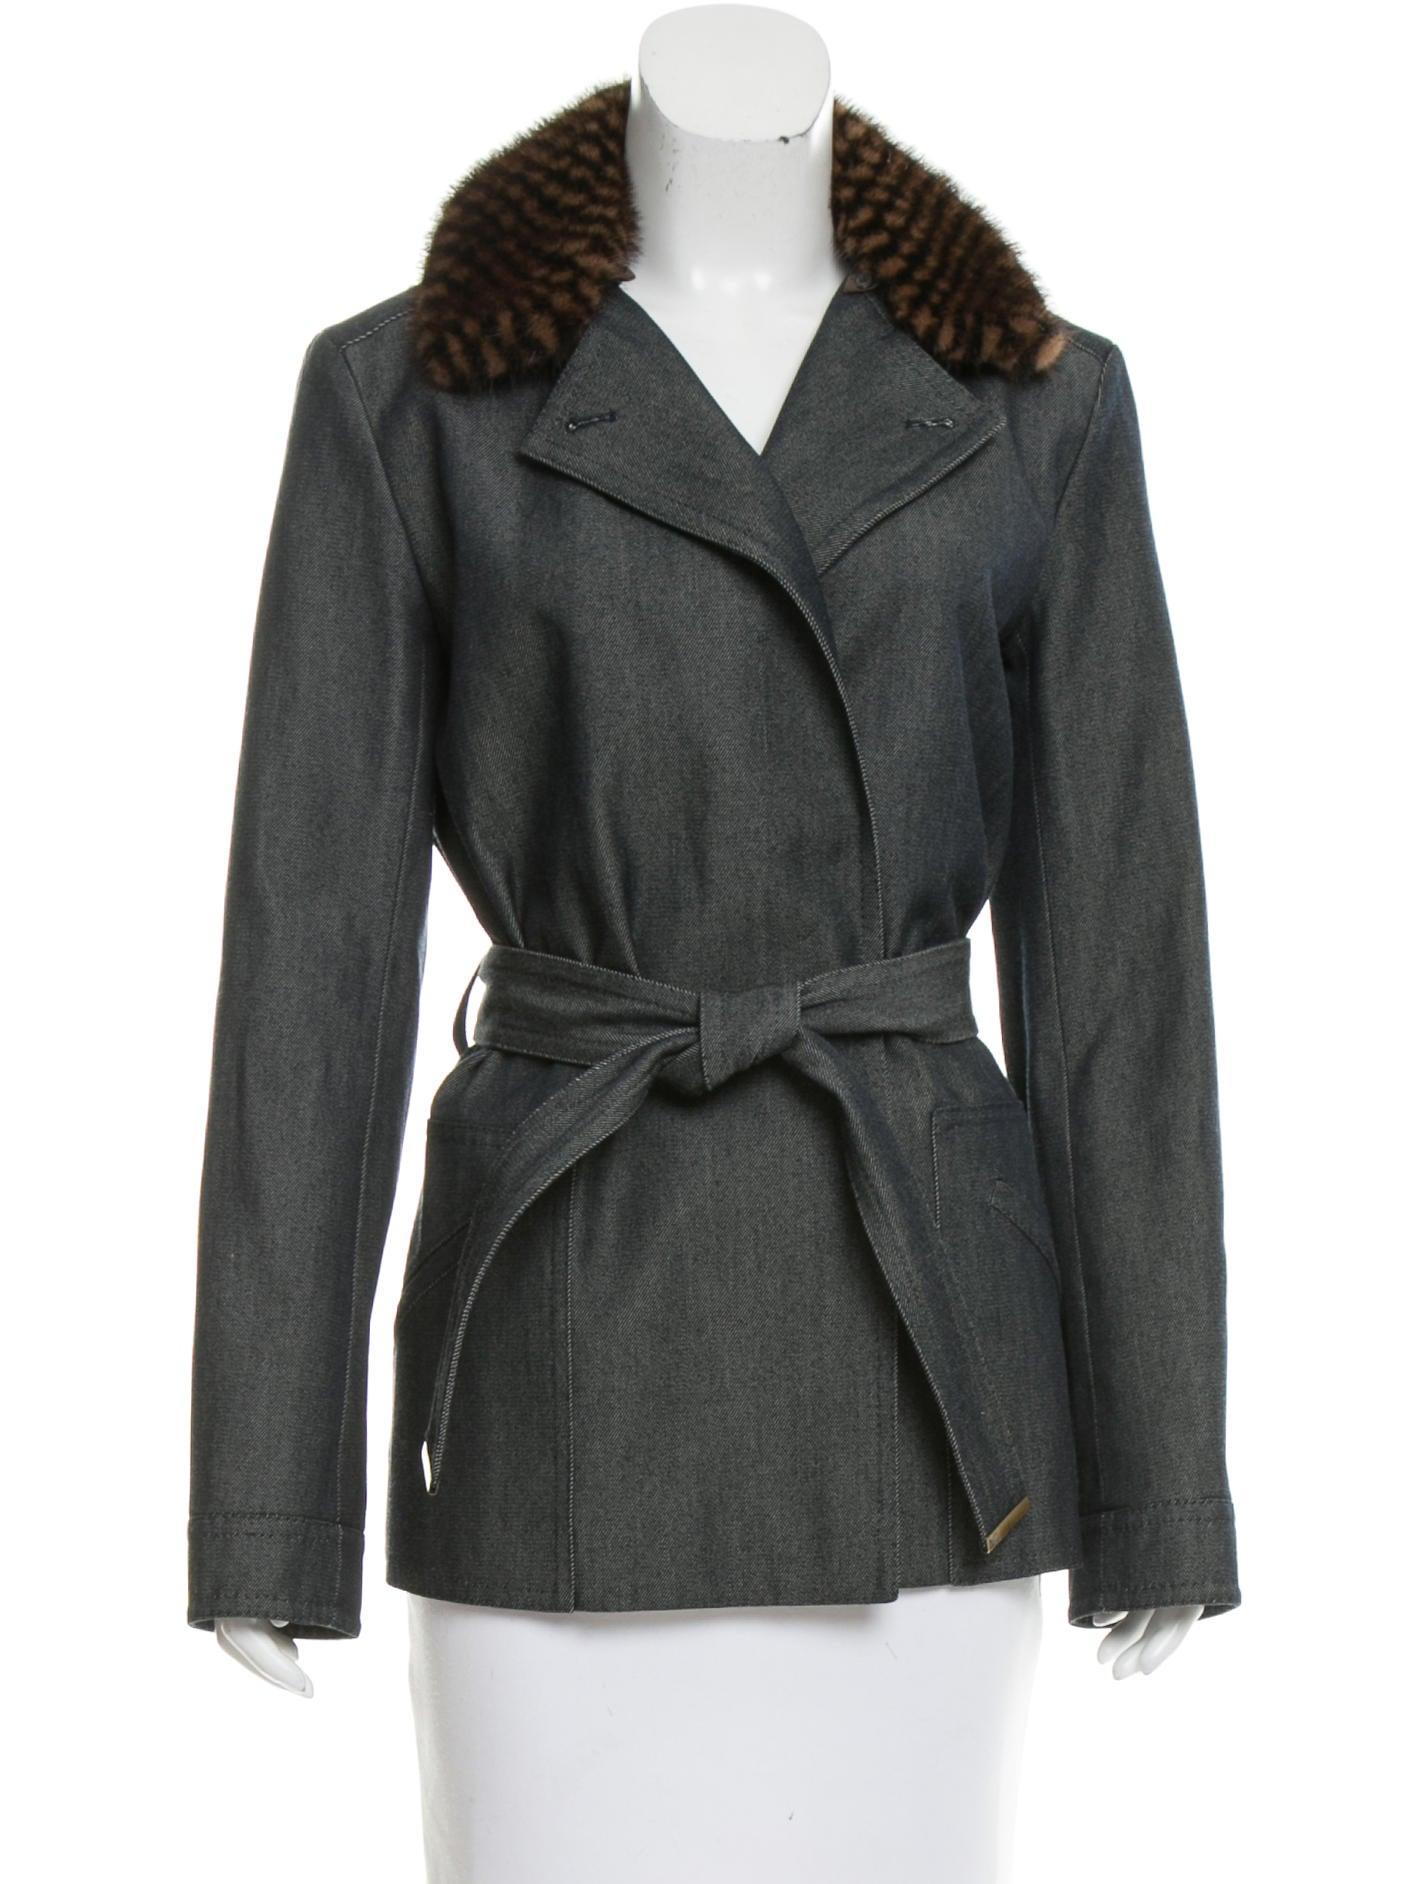 louis vuitton mink trimmed twill jacket clothing. Black Bedroom Furniture Sets. Home Design Ideas